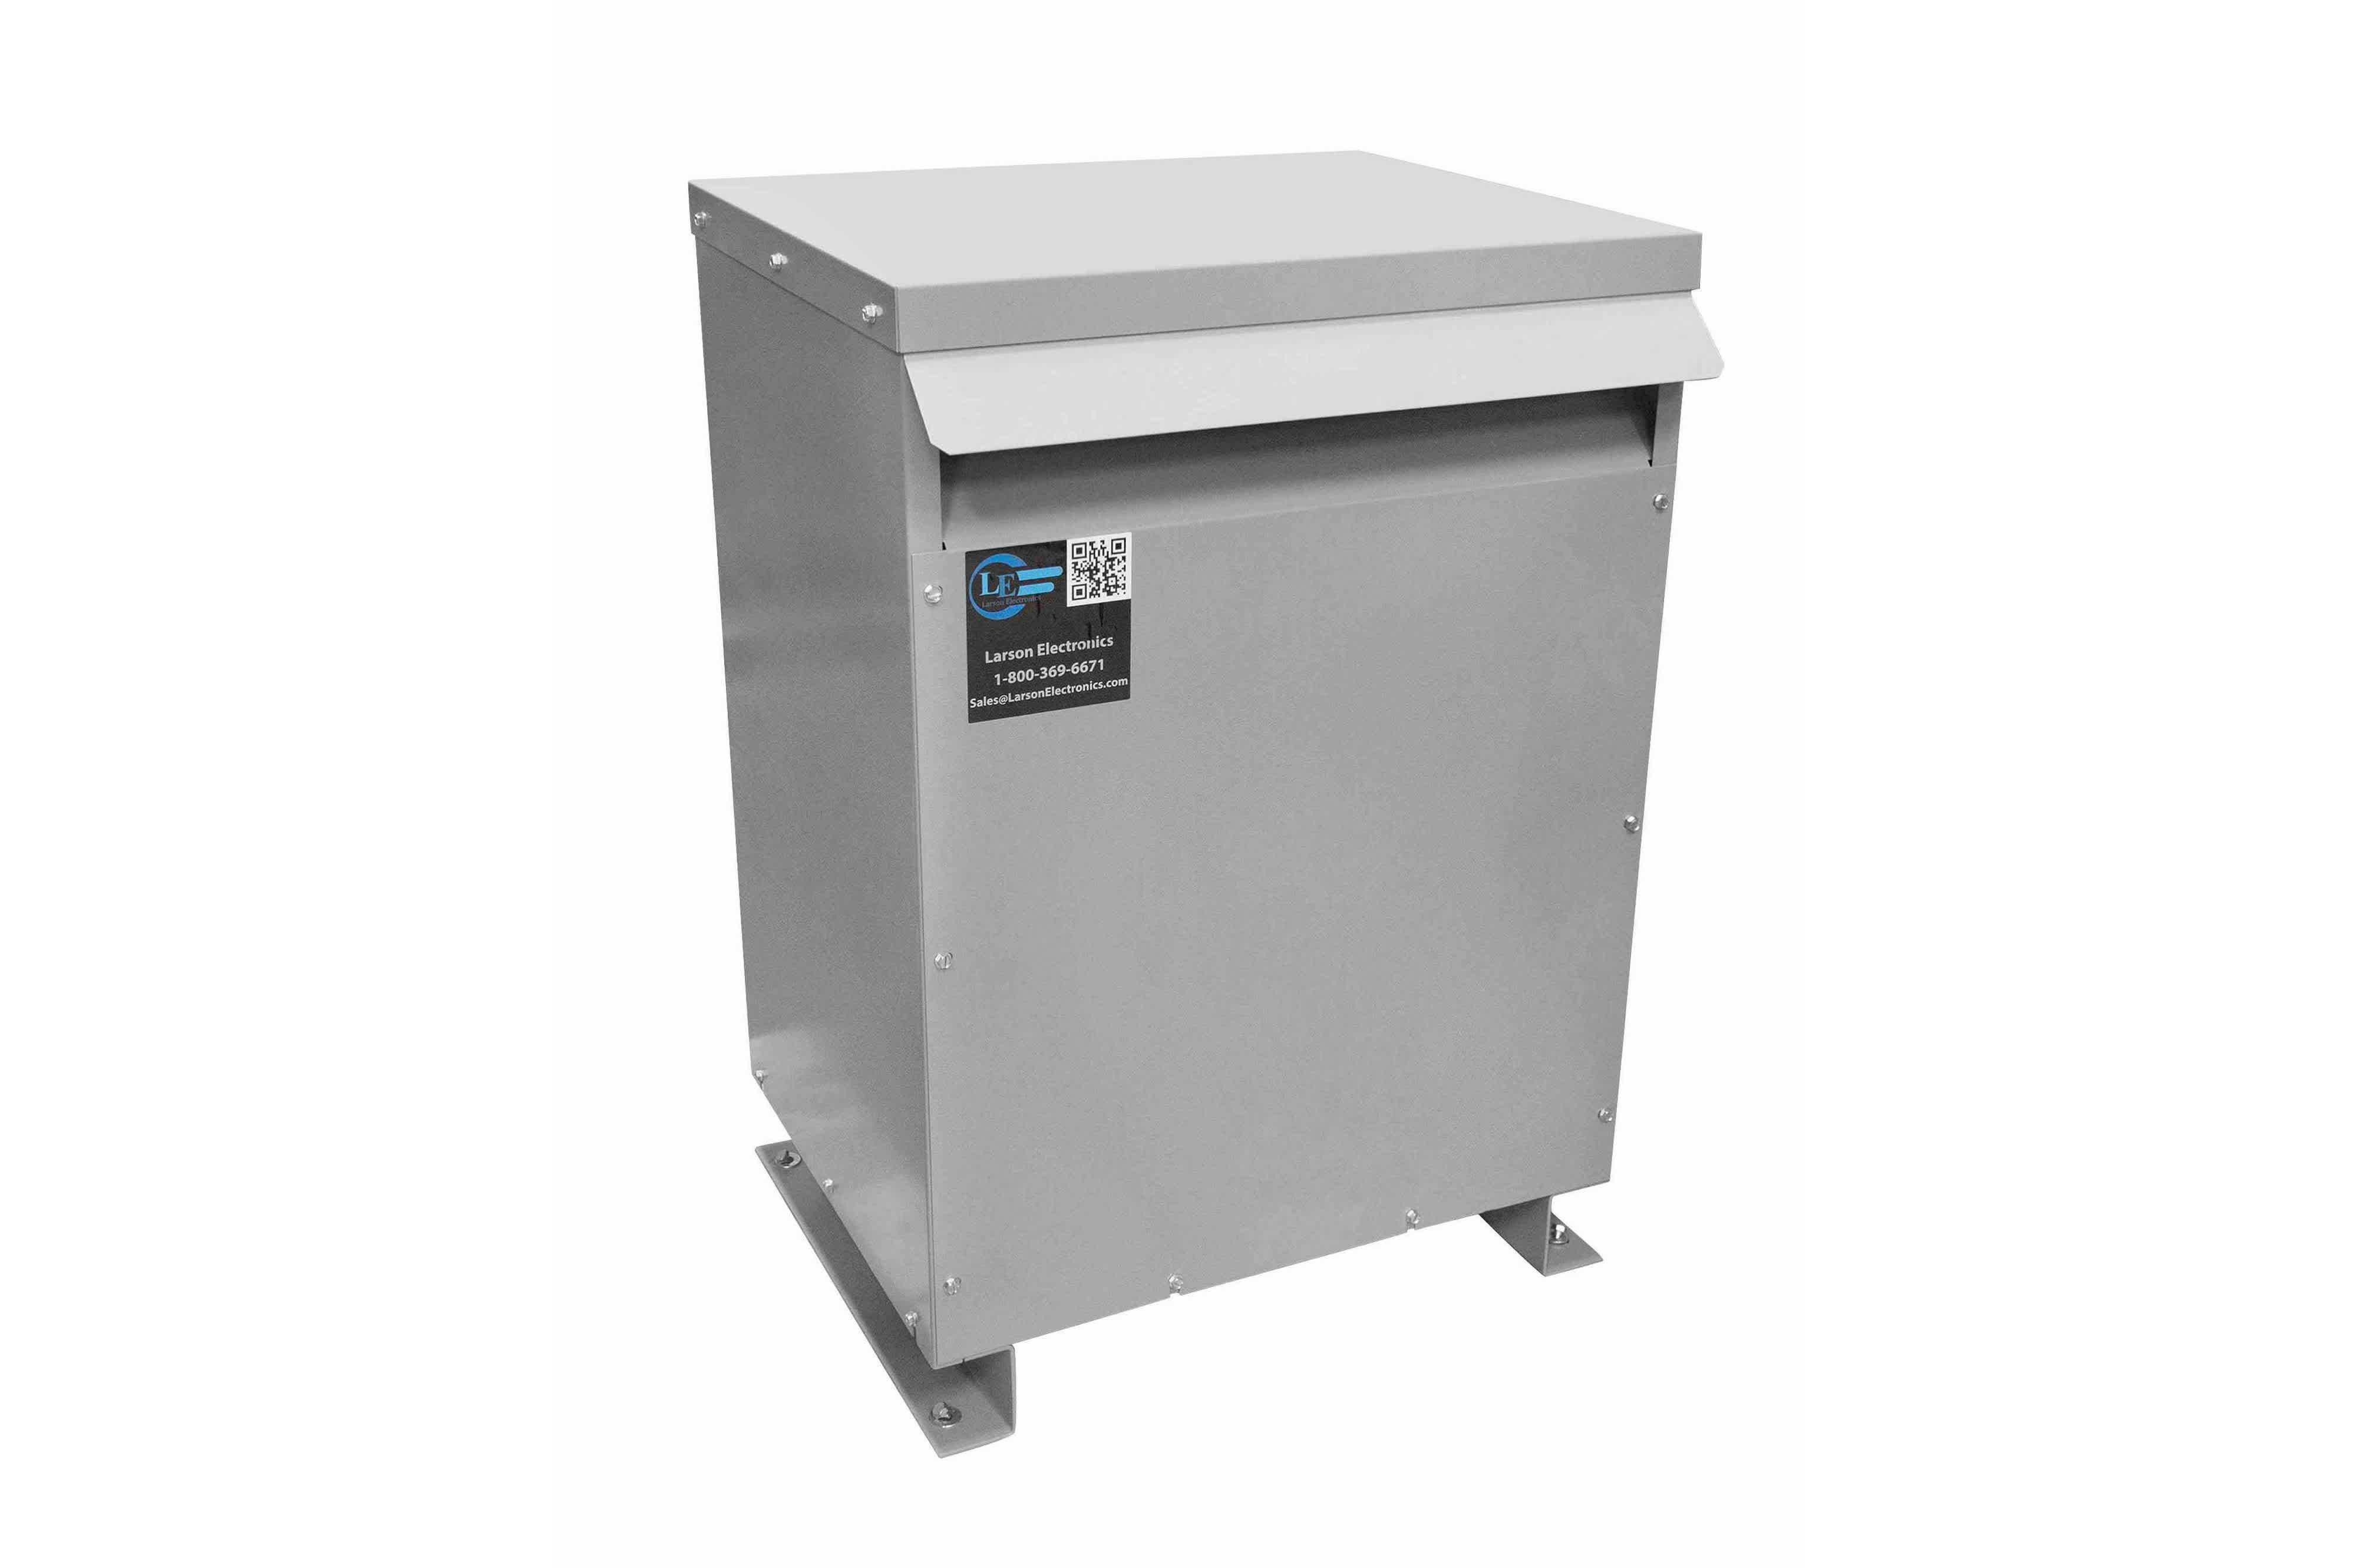 750 kVA 3PH DOE Transformer, 480V Delta Primary, 600Y/347 Wye-N Secondary, N3R, Ventilated, 60 Hz